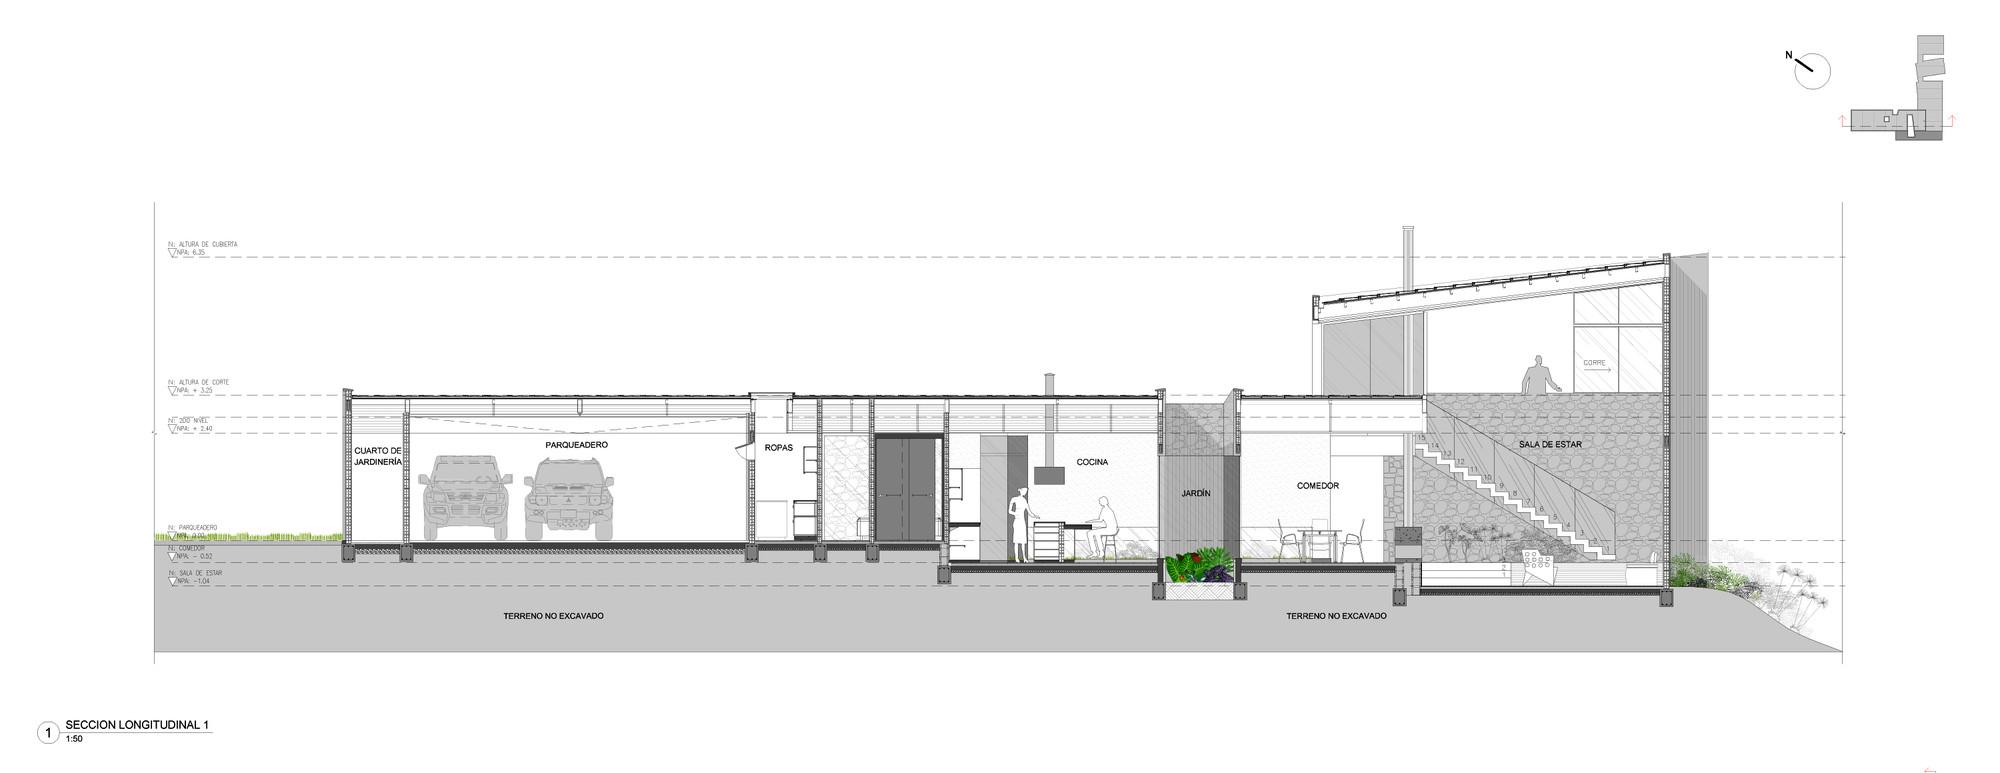 Galeria de casa entre jardins planta baja estudio de for Arq estudio de arquitectura